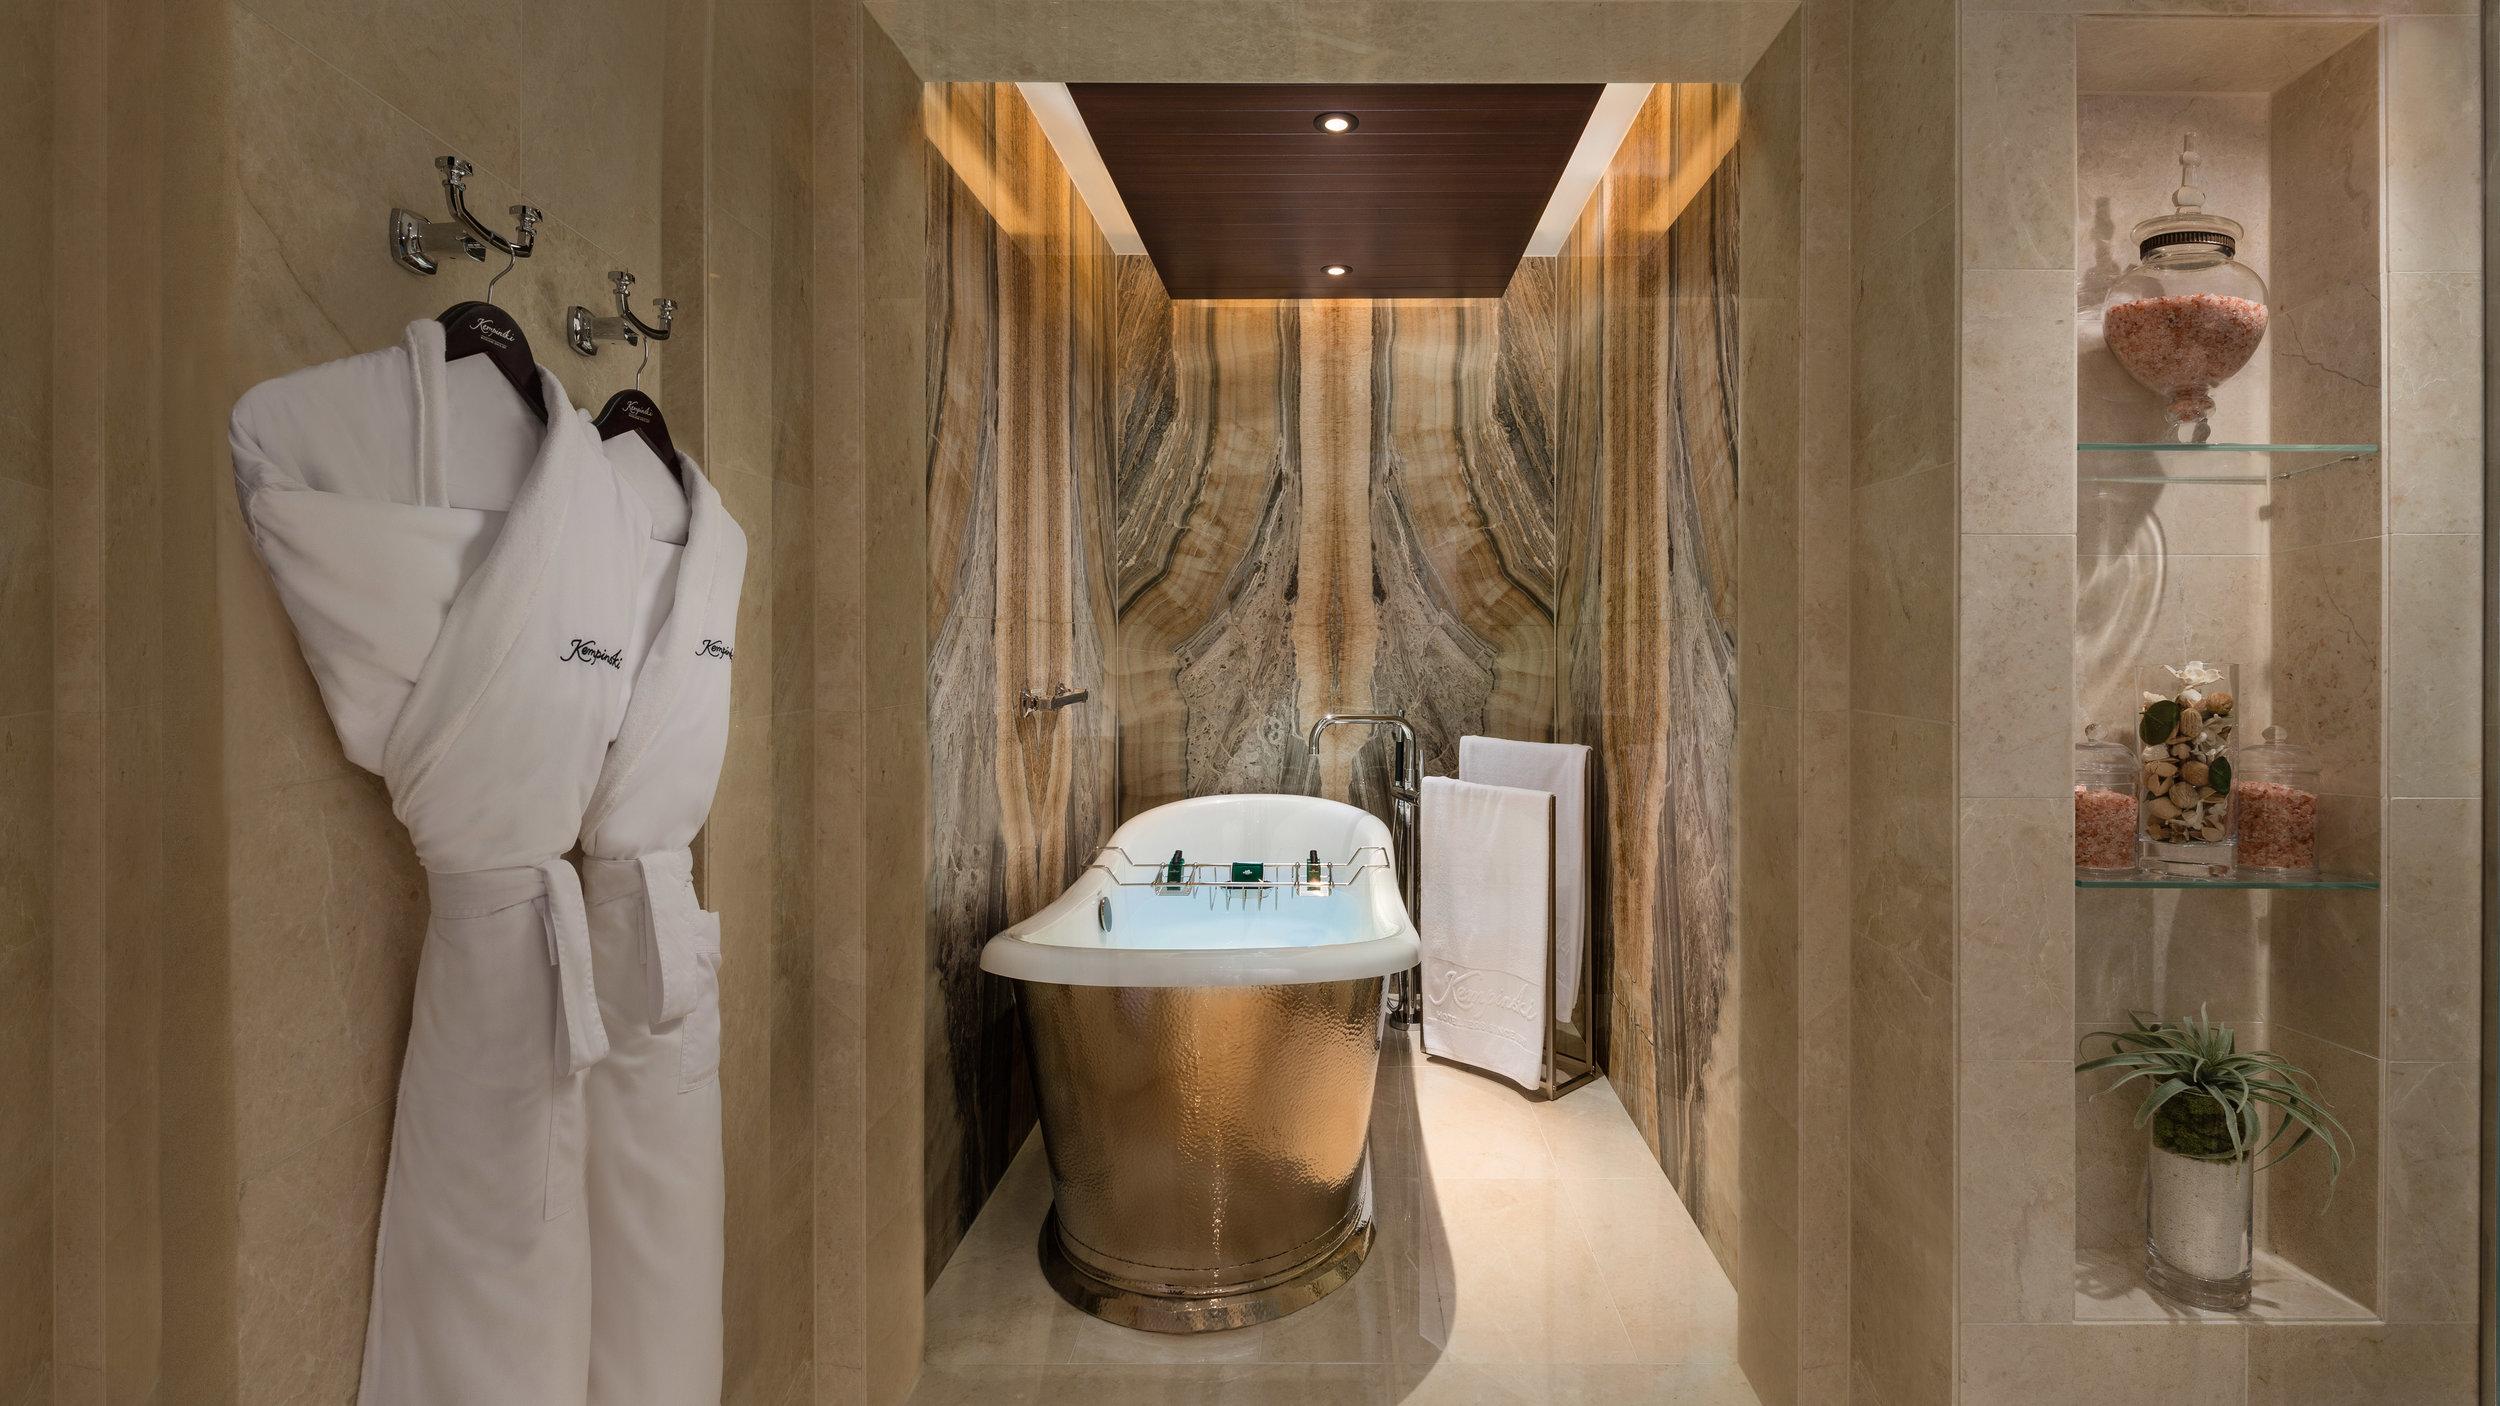 Kempinski Hotel Mall of the Emirates Dubai 10.jpg